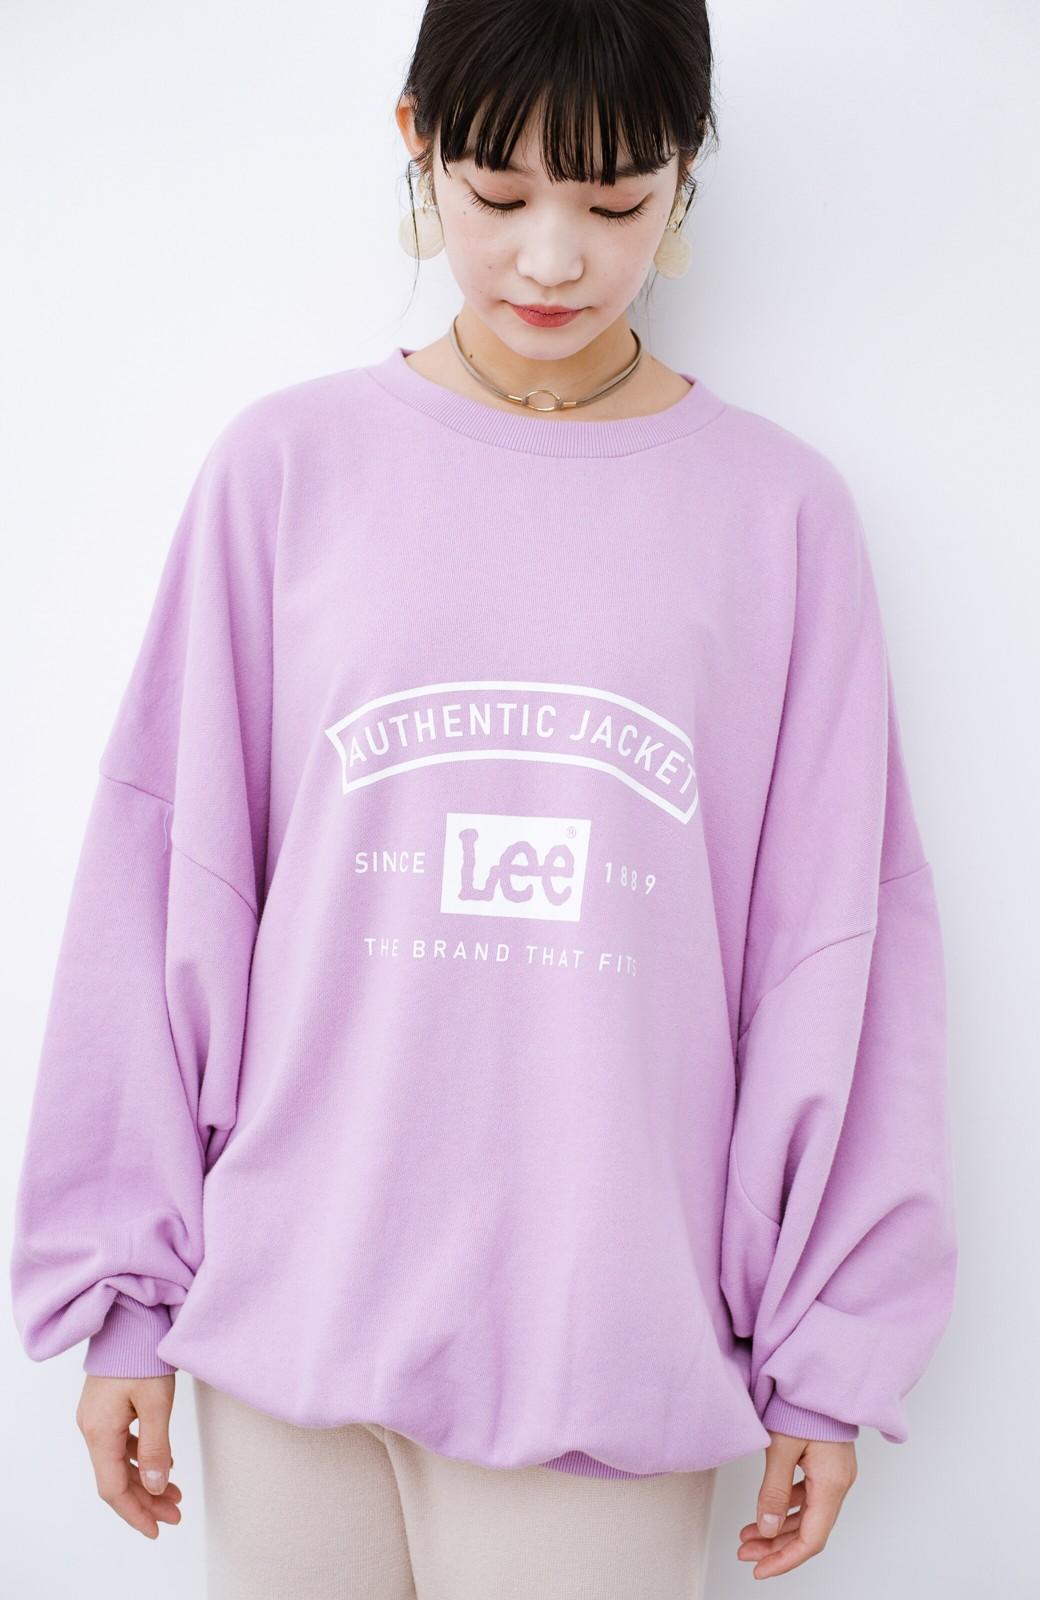 haco! Lady Lee メンズライクなだぼっとサイズ マカロンカラーが可愛いプルオーバー <ラベンダー>の商品写真1